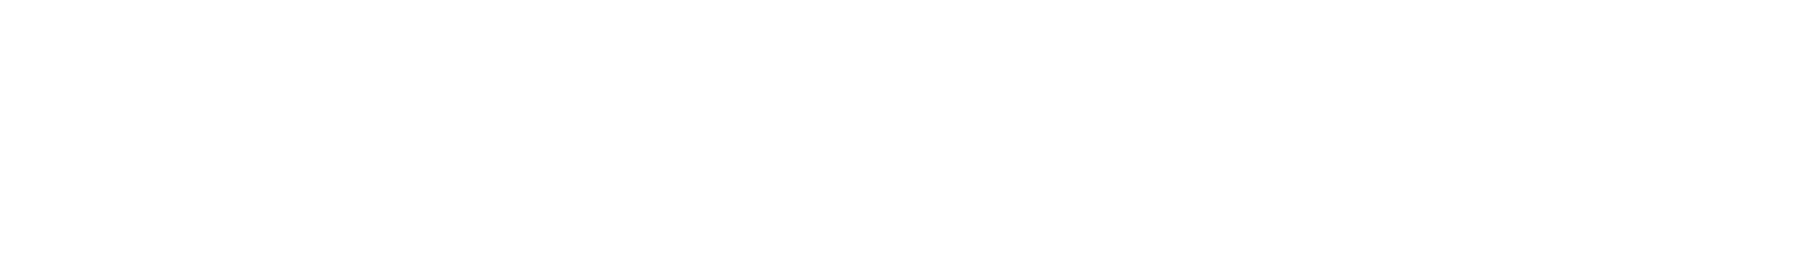 synth choir f